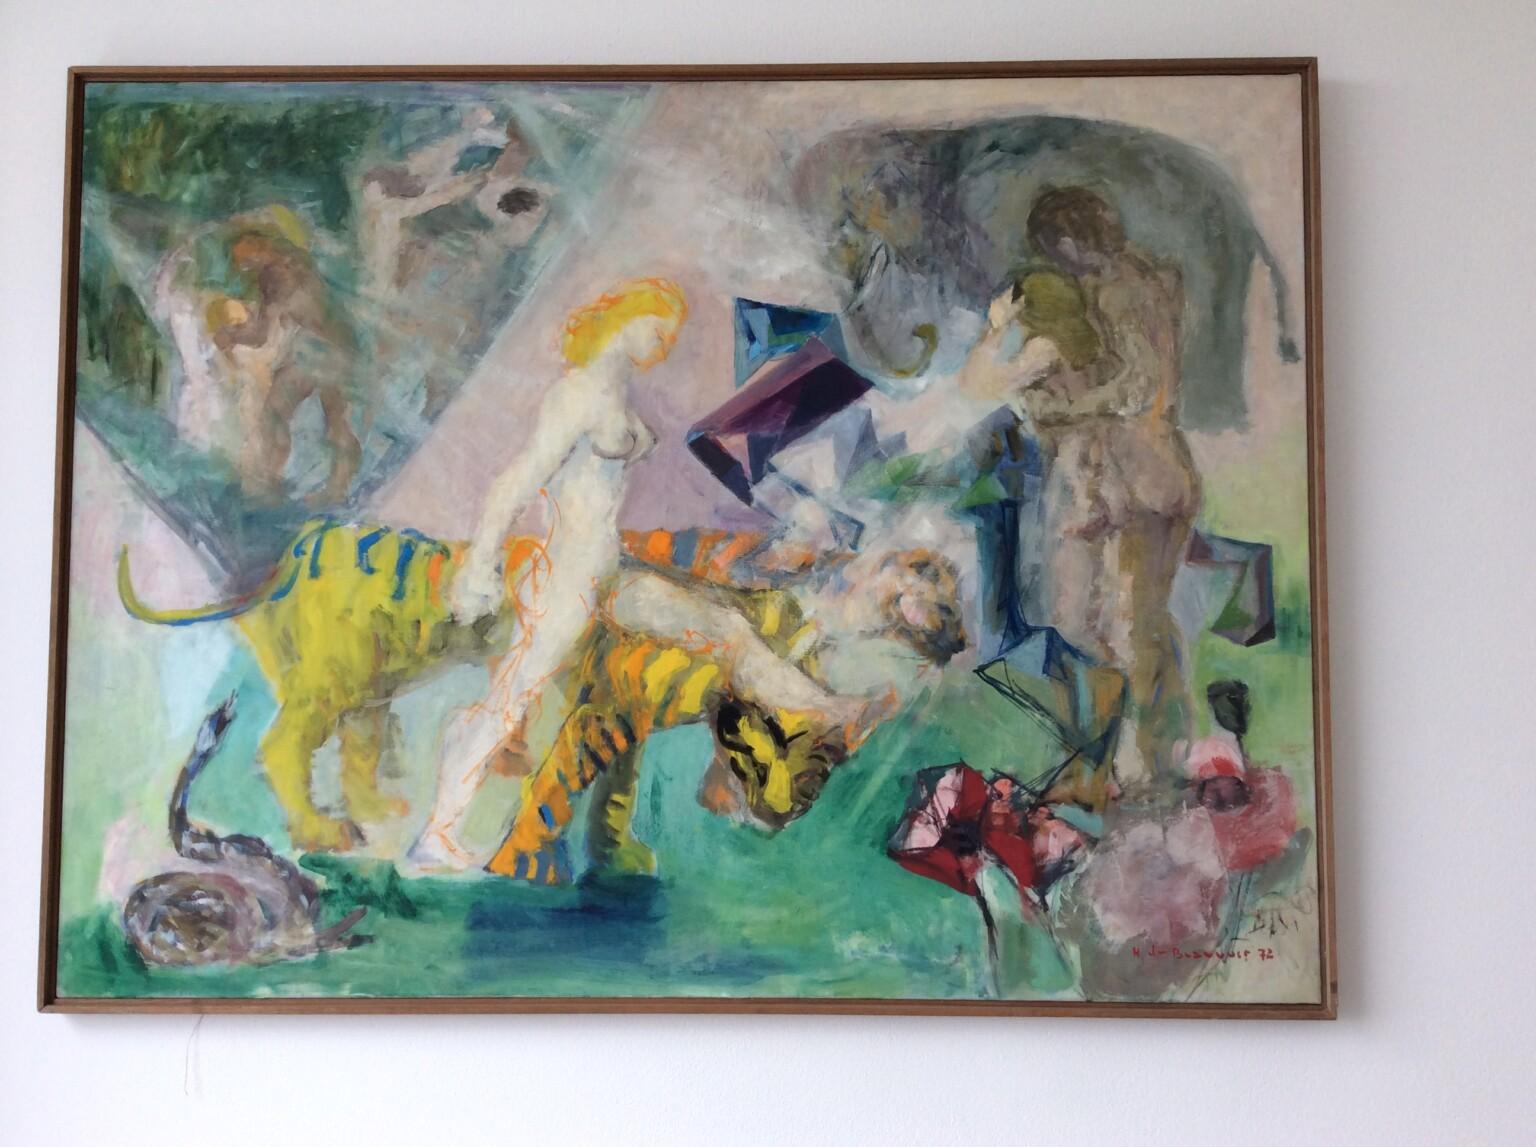 Bild des Werkes mit dem Titel: Le paradis perdu (Das verlorene Paradies)